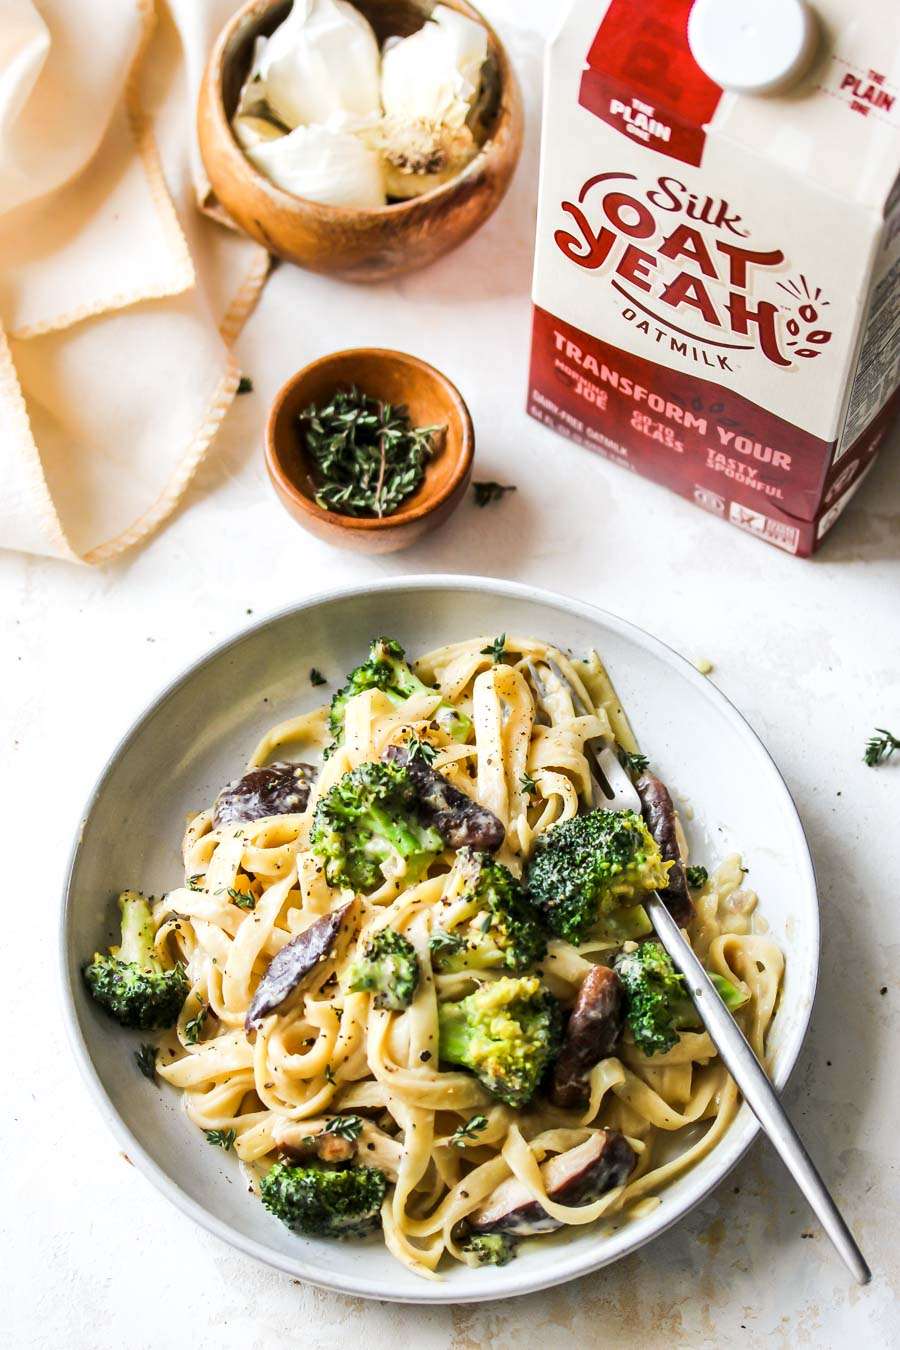 Broccoli and Mushroom Fettuccine with Miso Cream Sauce